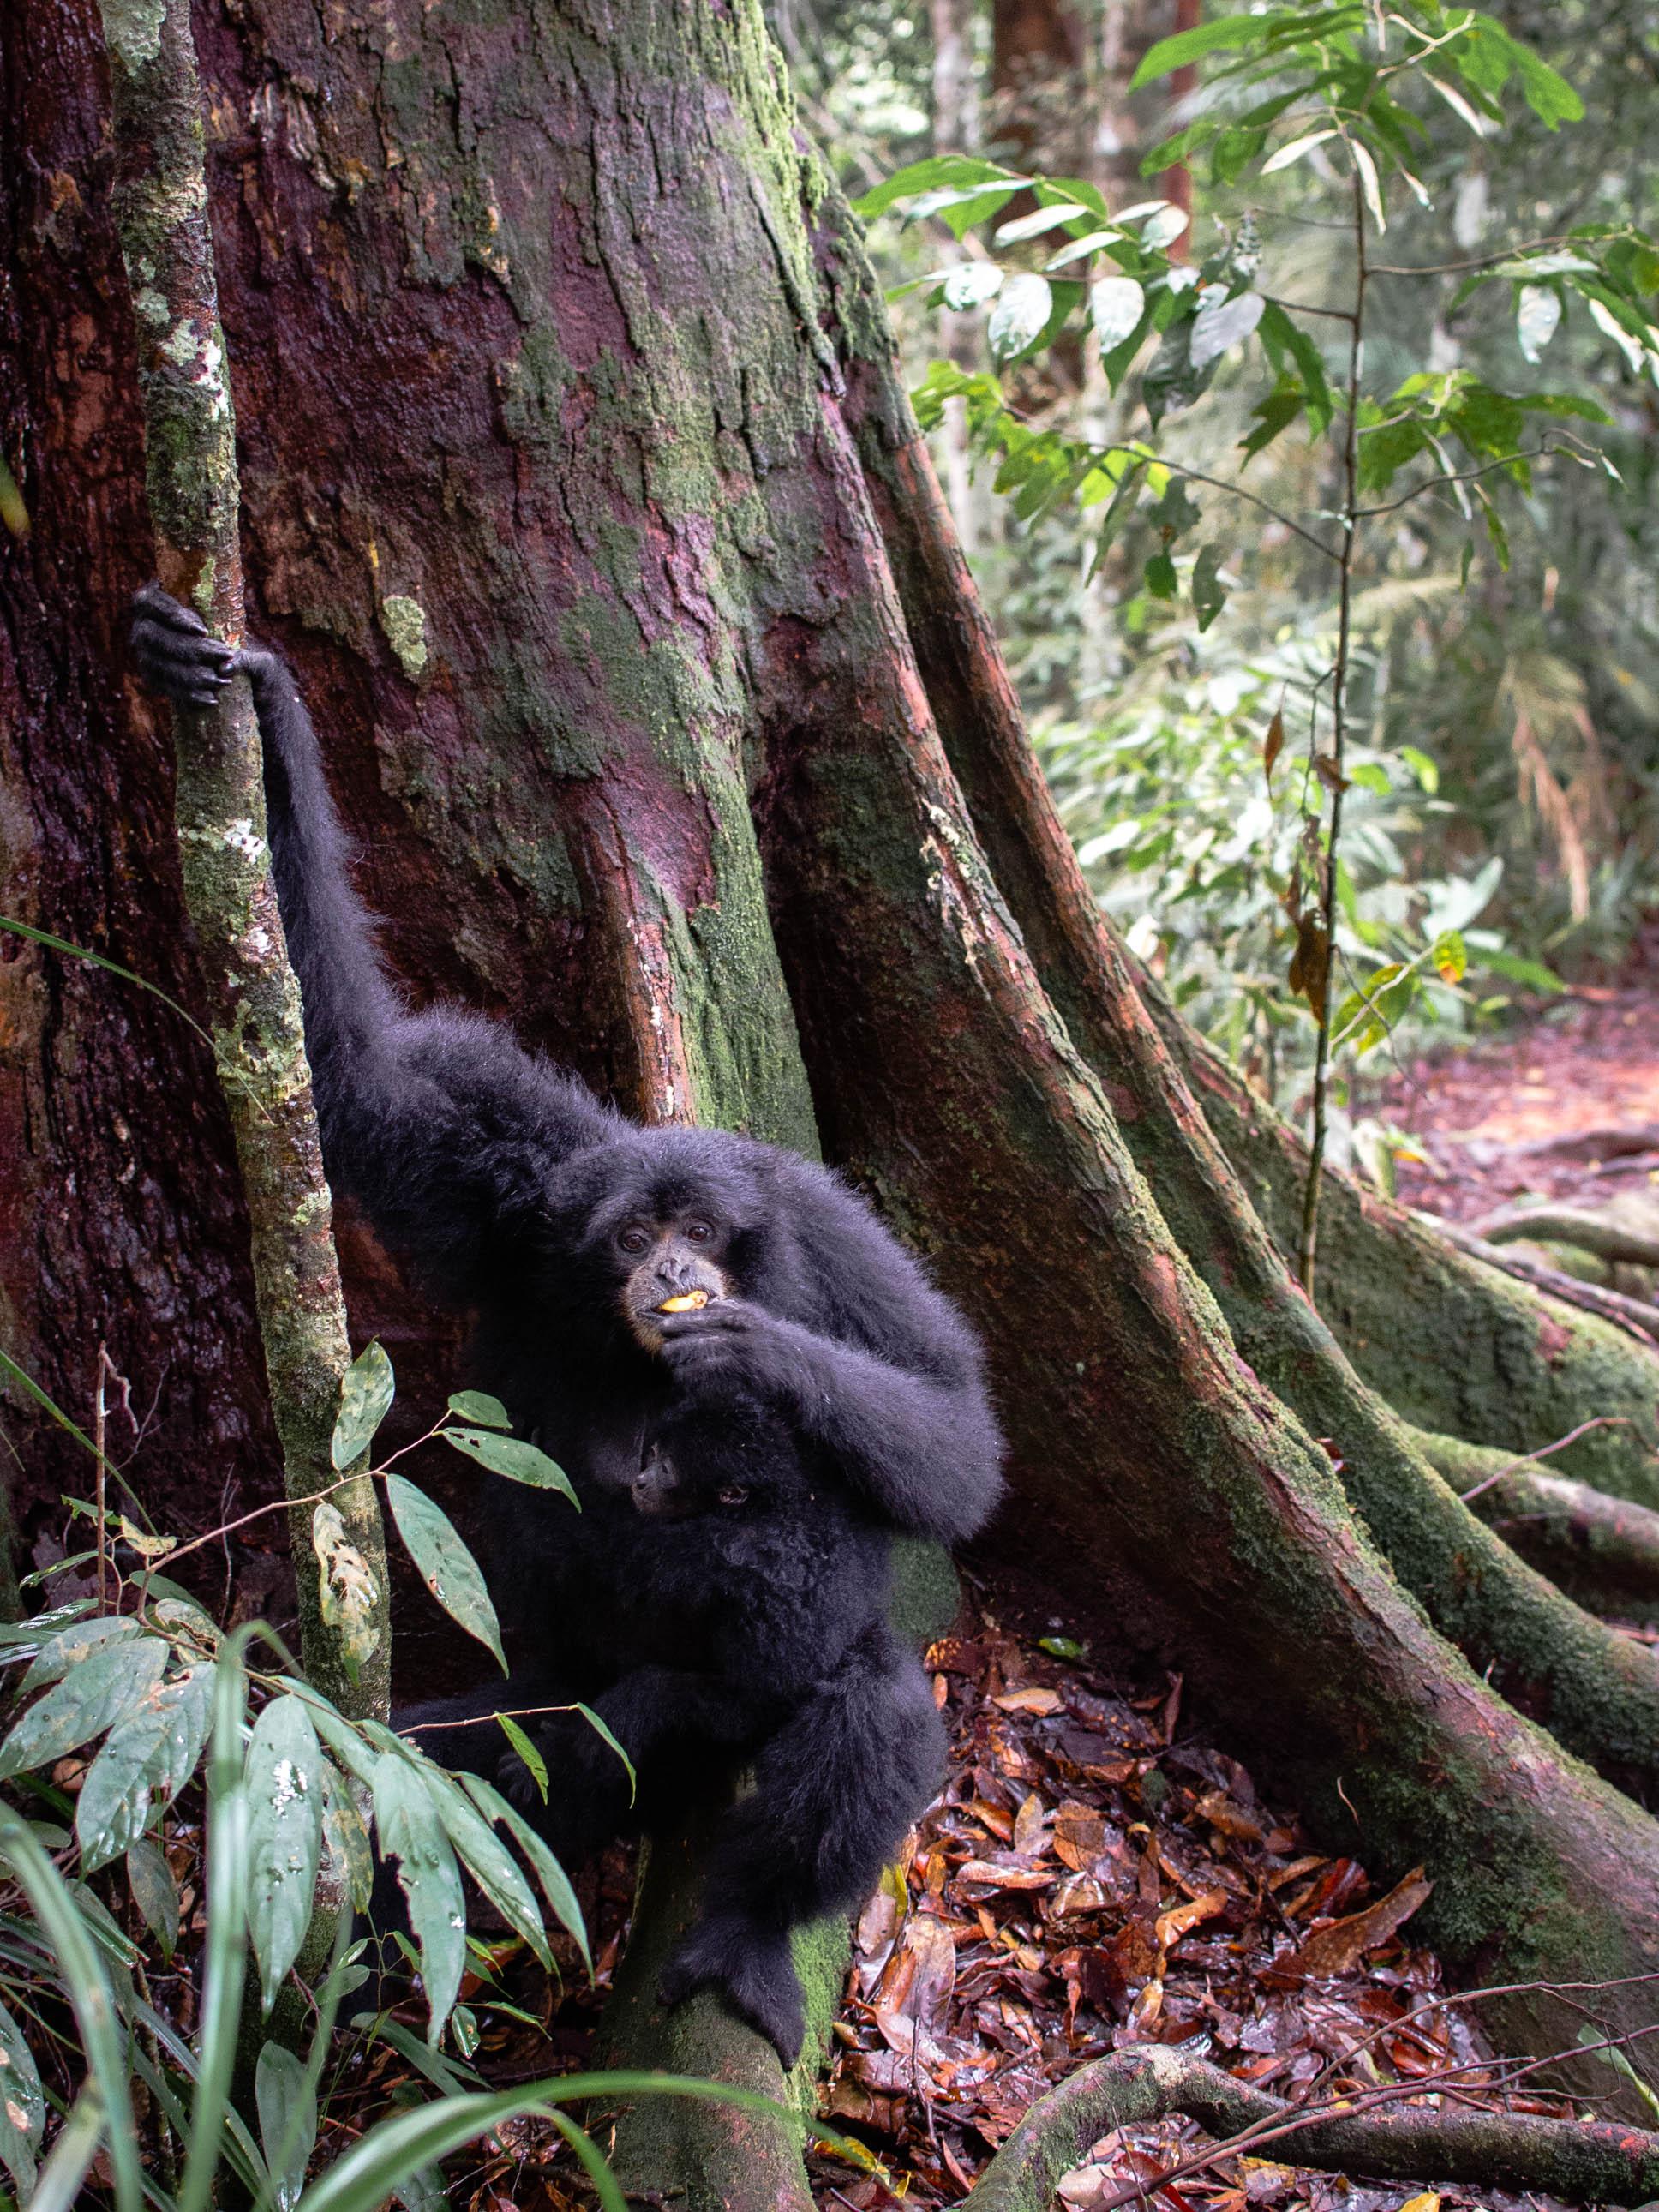 Mother siamang monkey and her baby | Orangutan Trekking in the Jungles of Sumatra